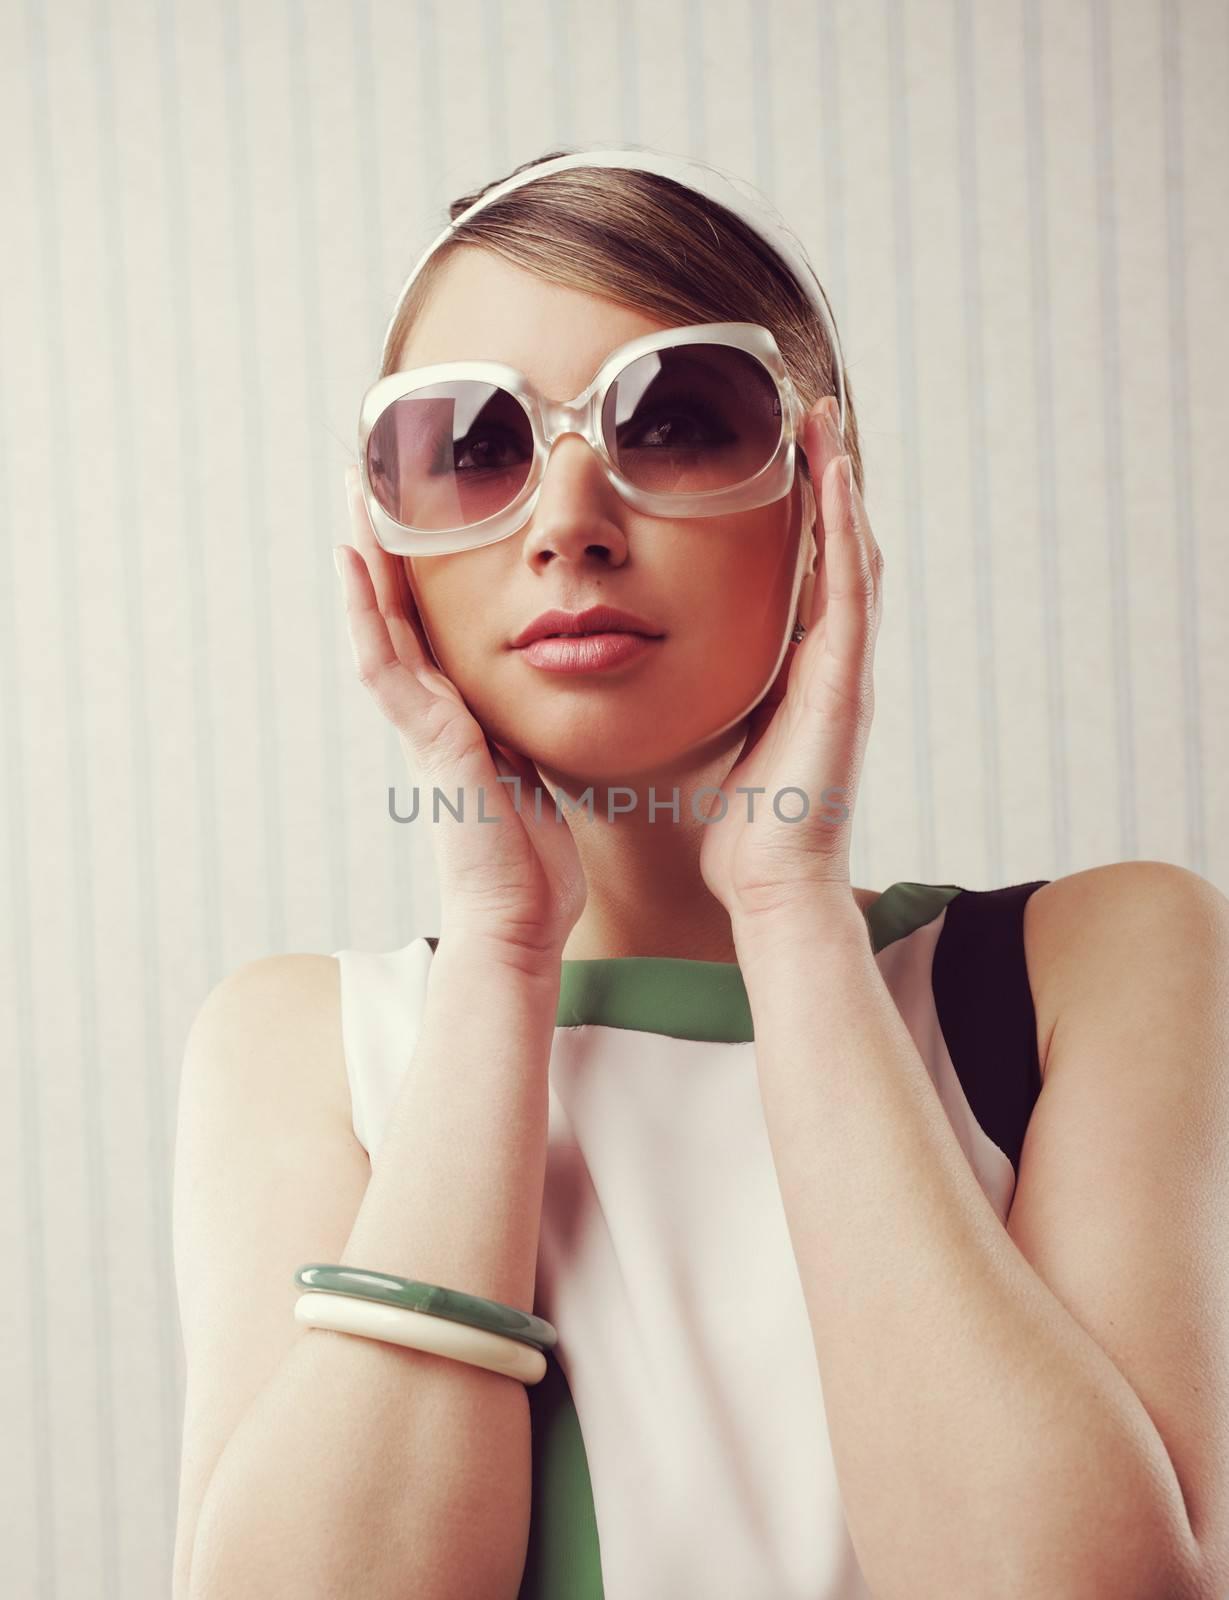 Portrait of fashion woman with retro sunglasses. 1960 style